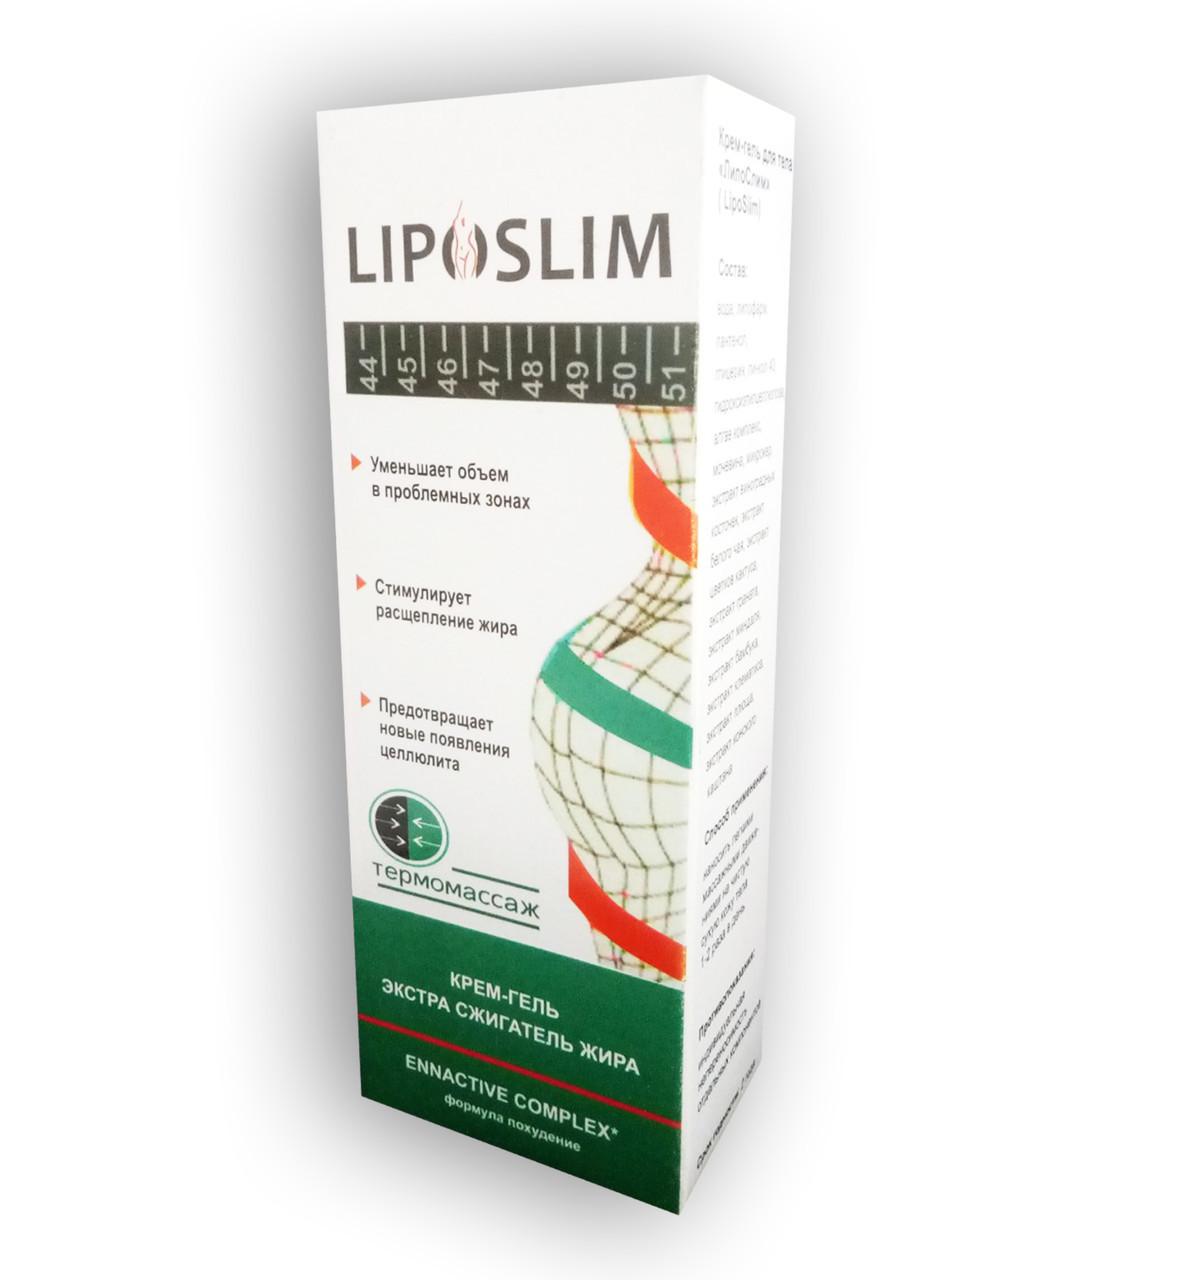 LipoSlim - Крем-гель жиросжигающий (ЛипоСлим) #E/N